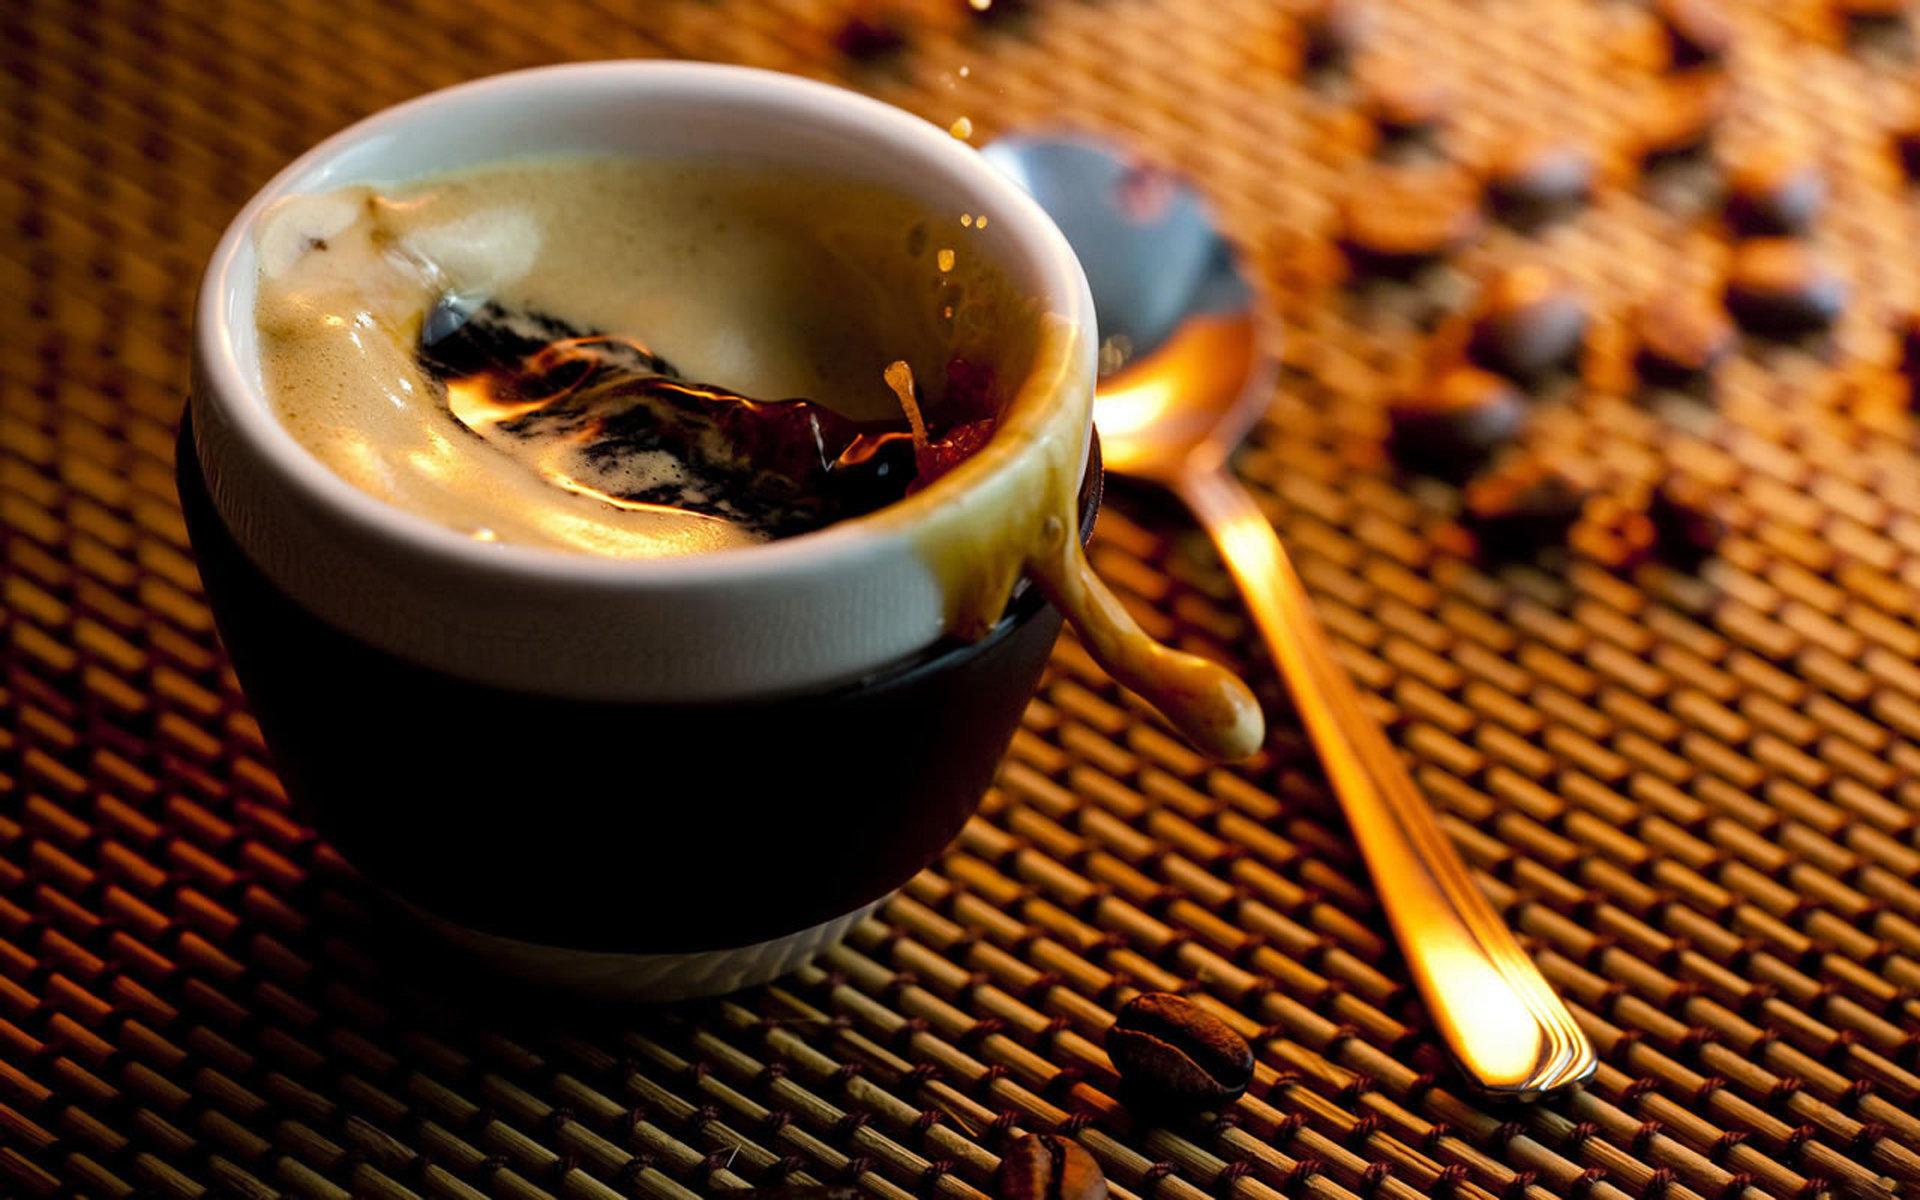 wonderful-coffee-mood-wallpaper-44048-45147-hd-wallpapers